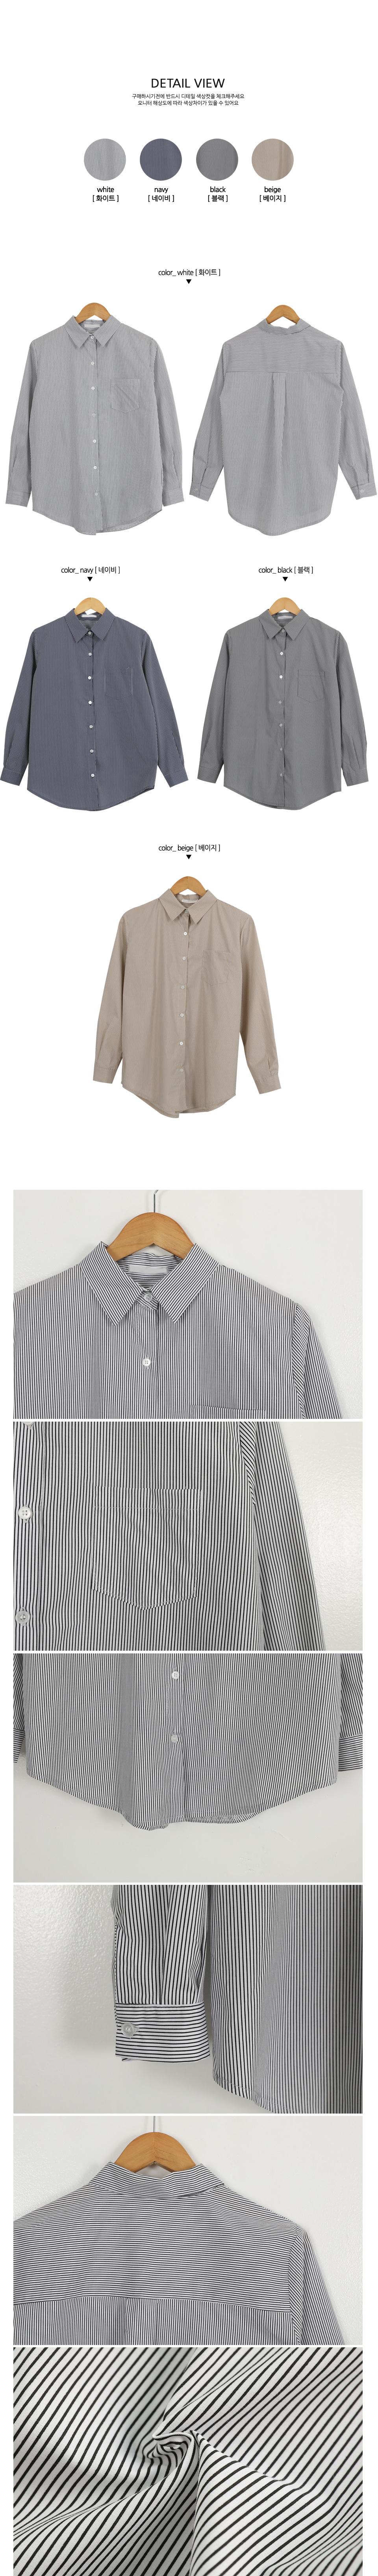 On ST Shirt